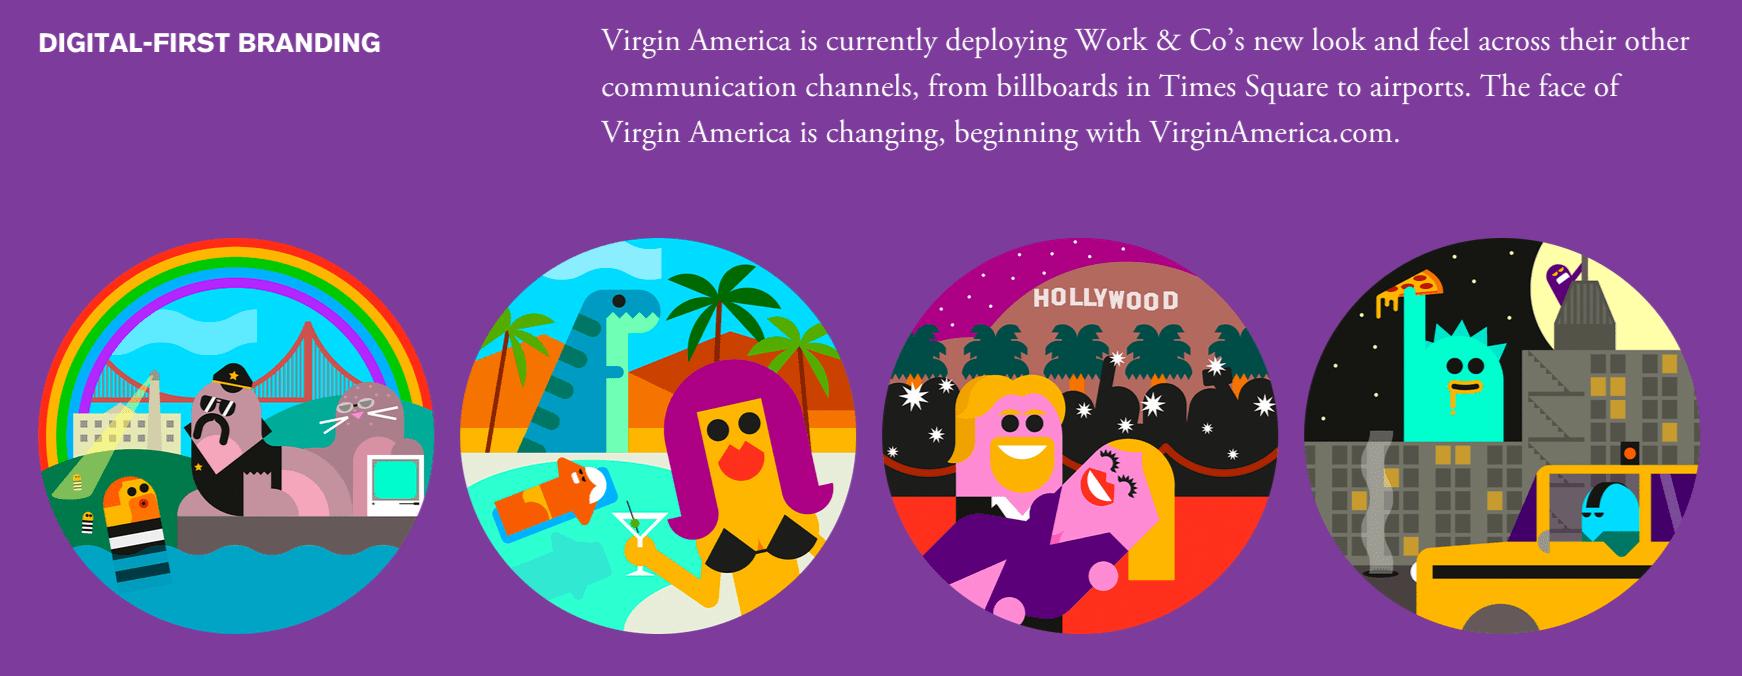 Case_Study__Virgin_America_-_Work___Co